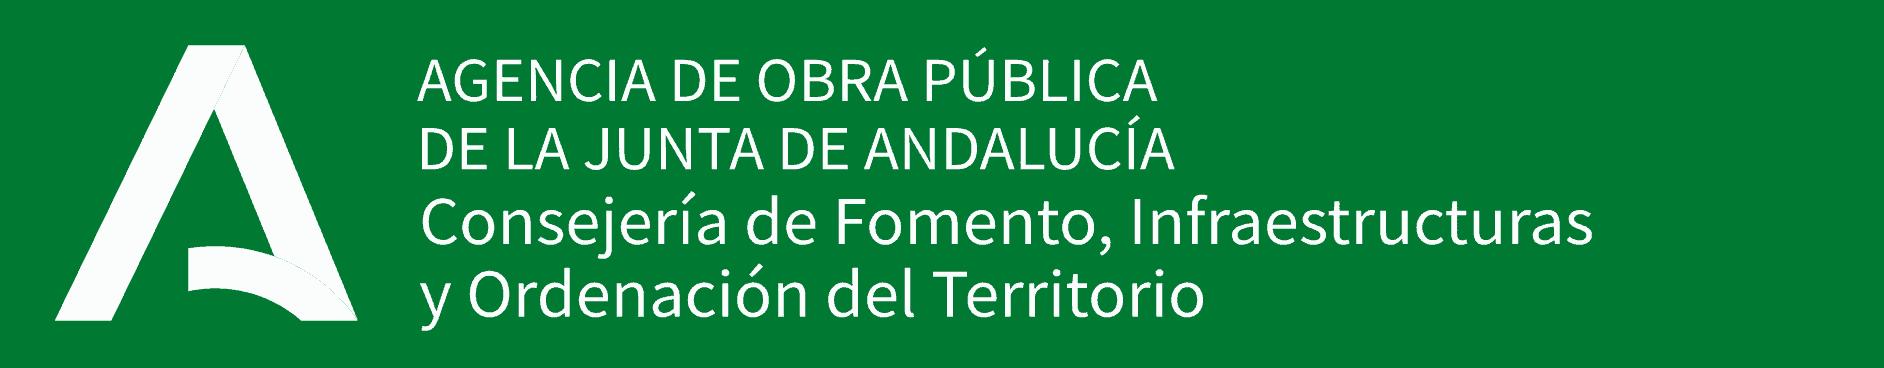 logo de la Agencia de Obra Pública de la Junta de Andalucía